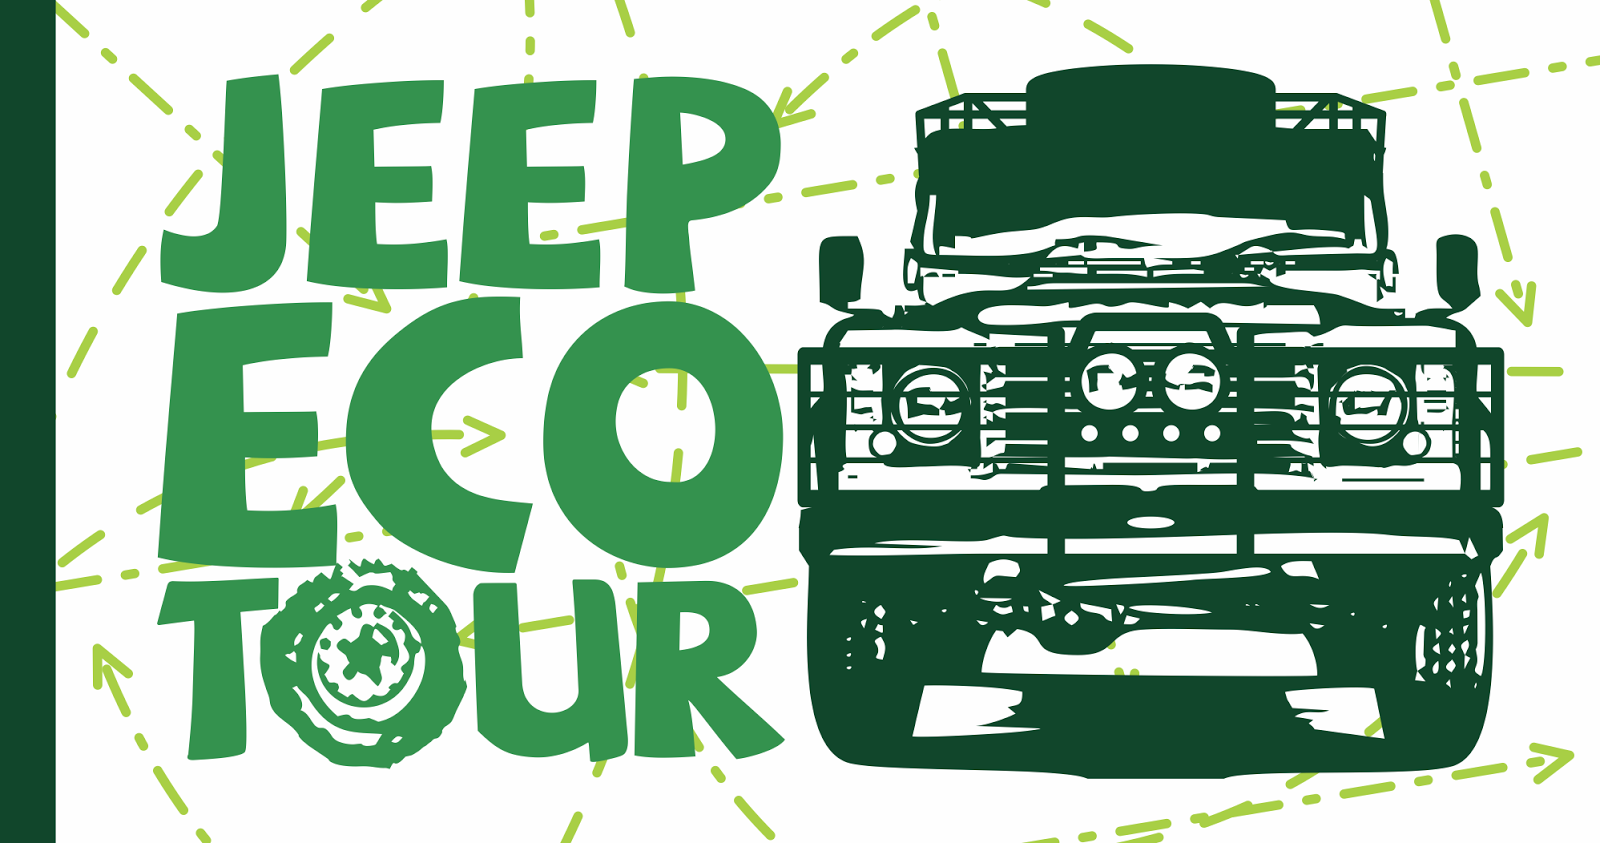 Jeep Eco Tour.